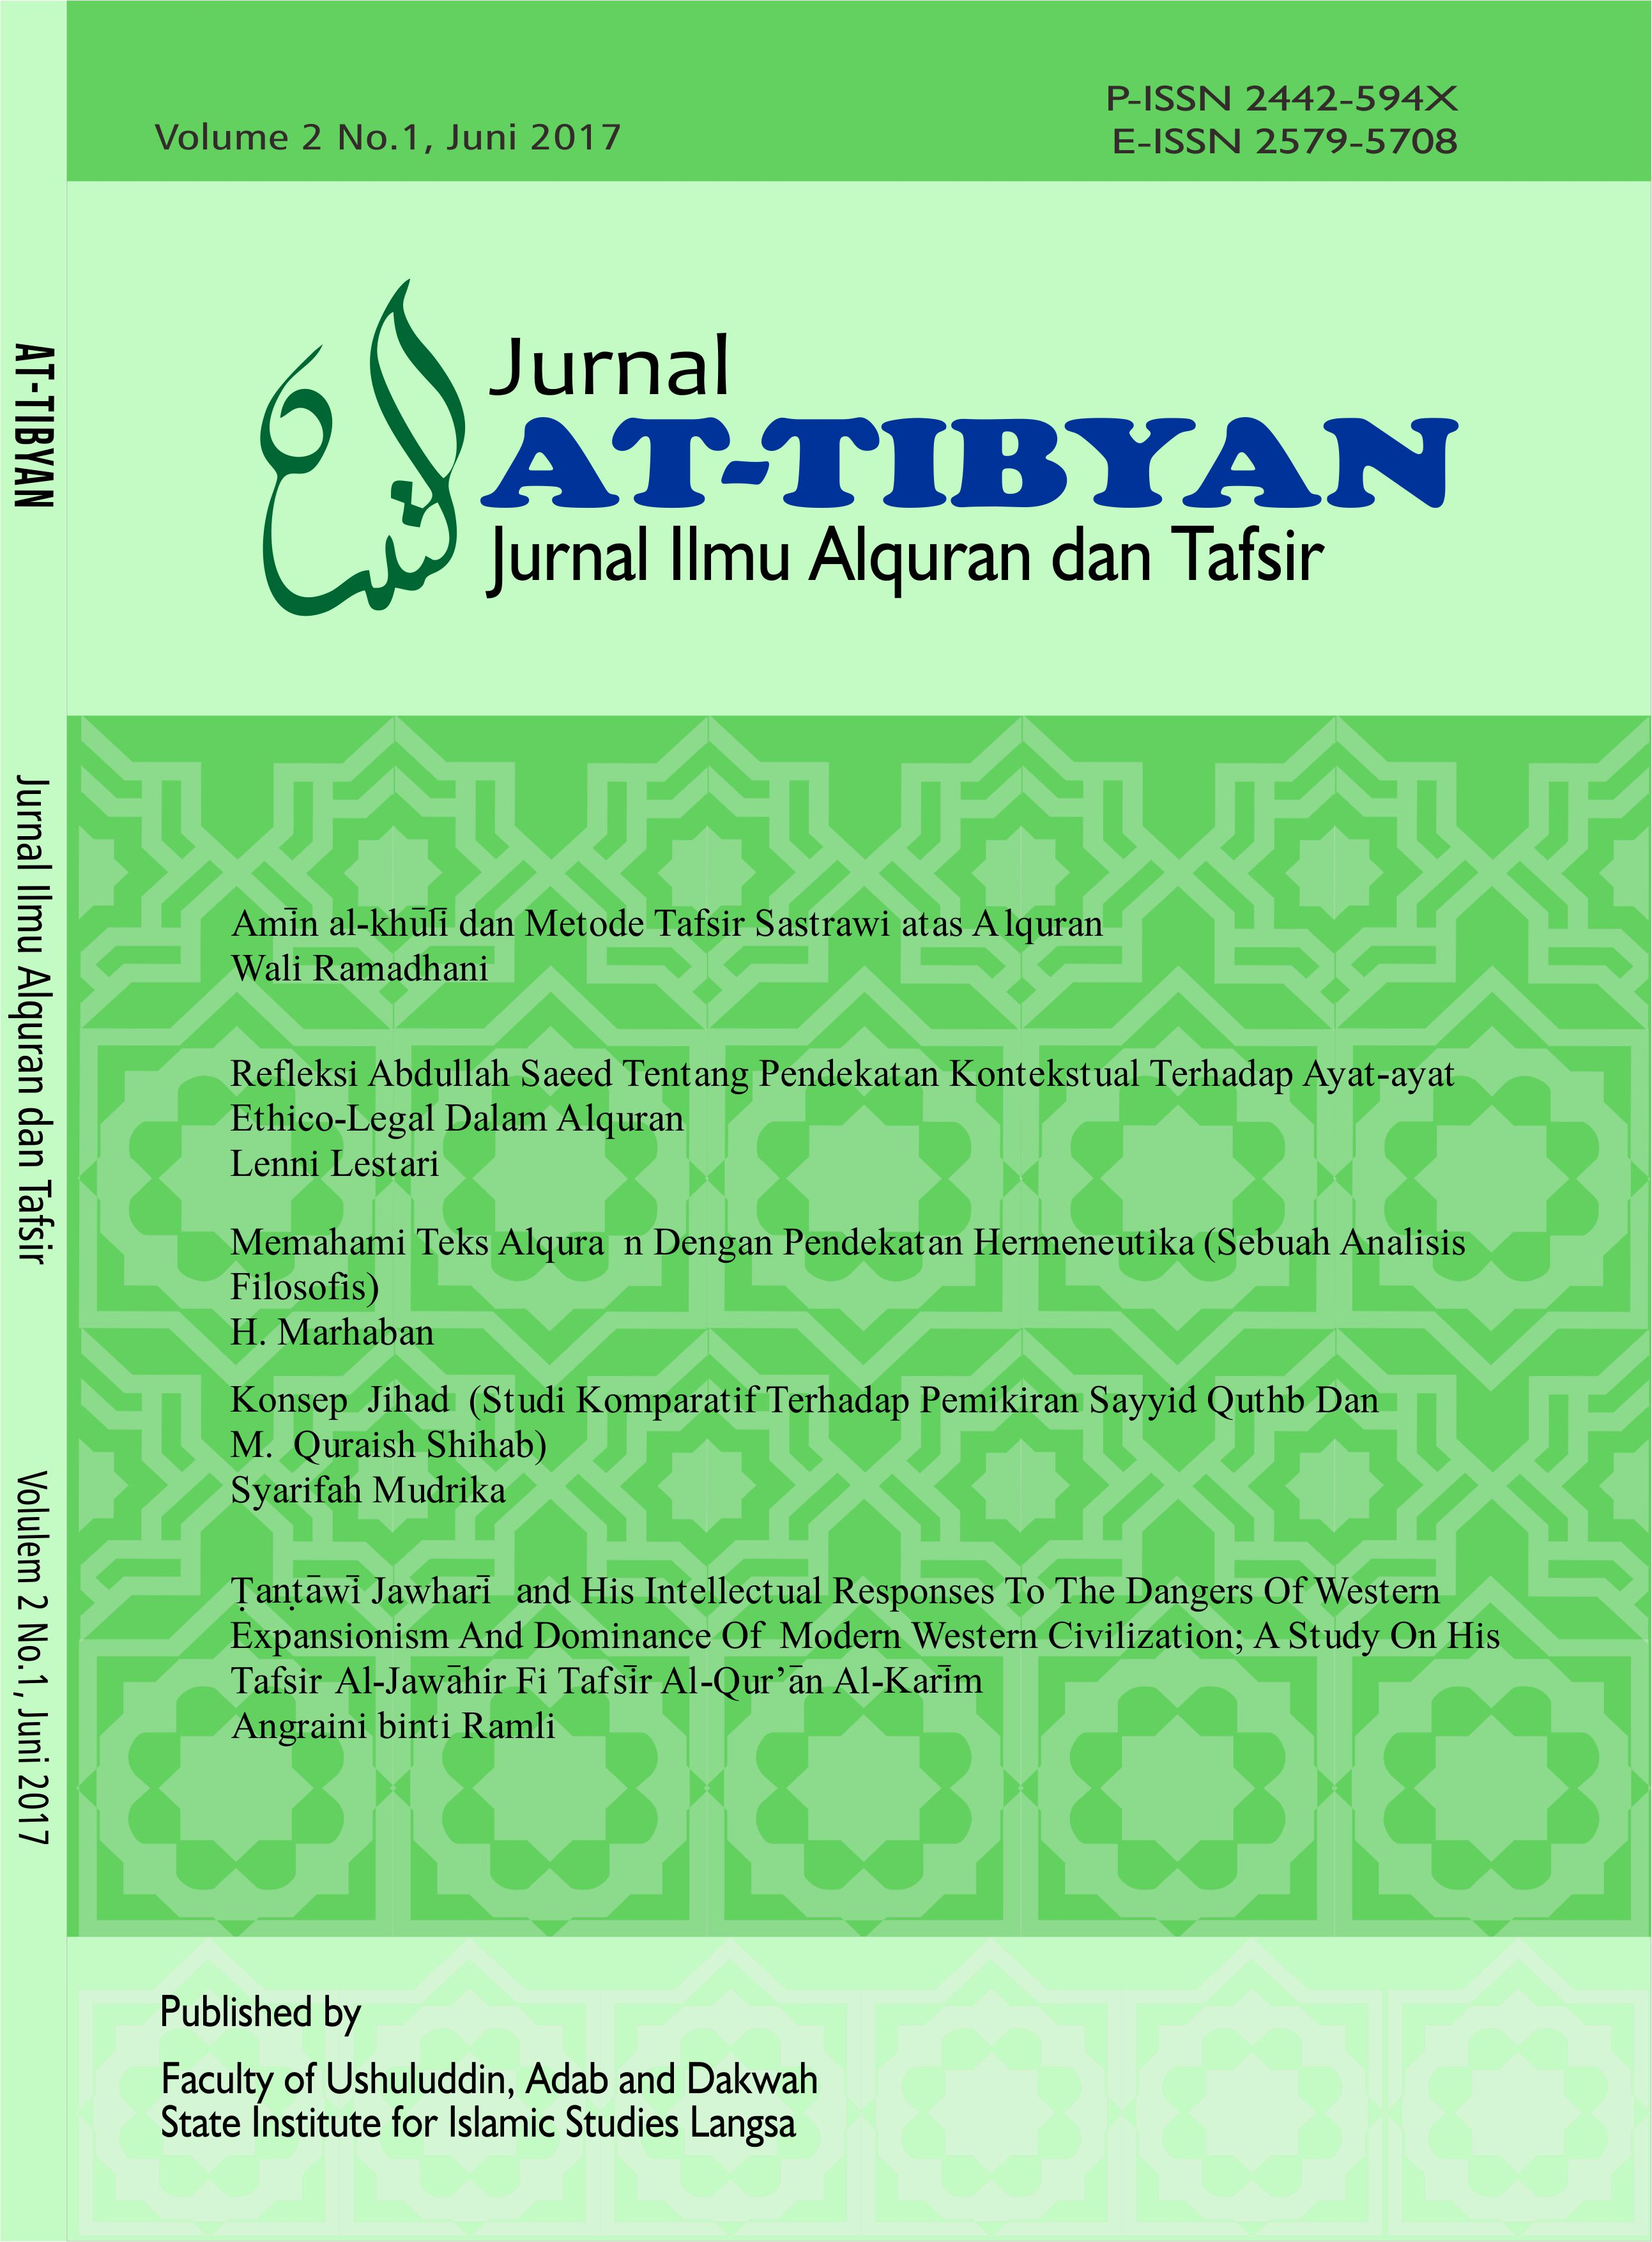 Keimanan Abu Thalib Studi Komparatif Terhadap Tafsir Ibn Kasir Dan Tafsir Al Mizan Jurnal At Tibyan Jurnal Ilmu Alqur An Dan Tafsir